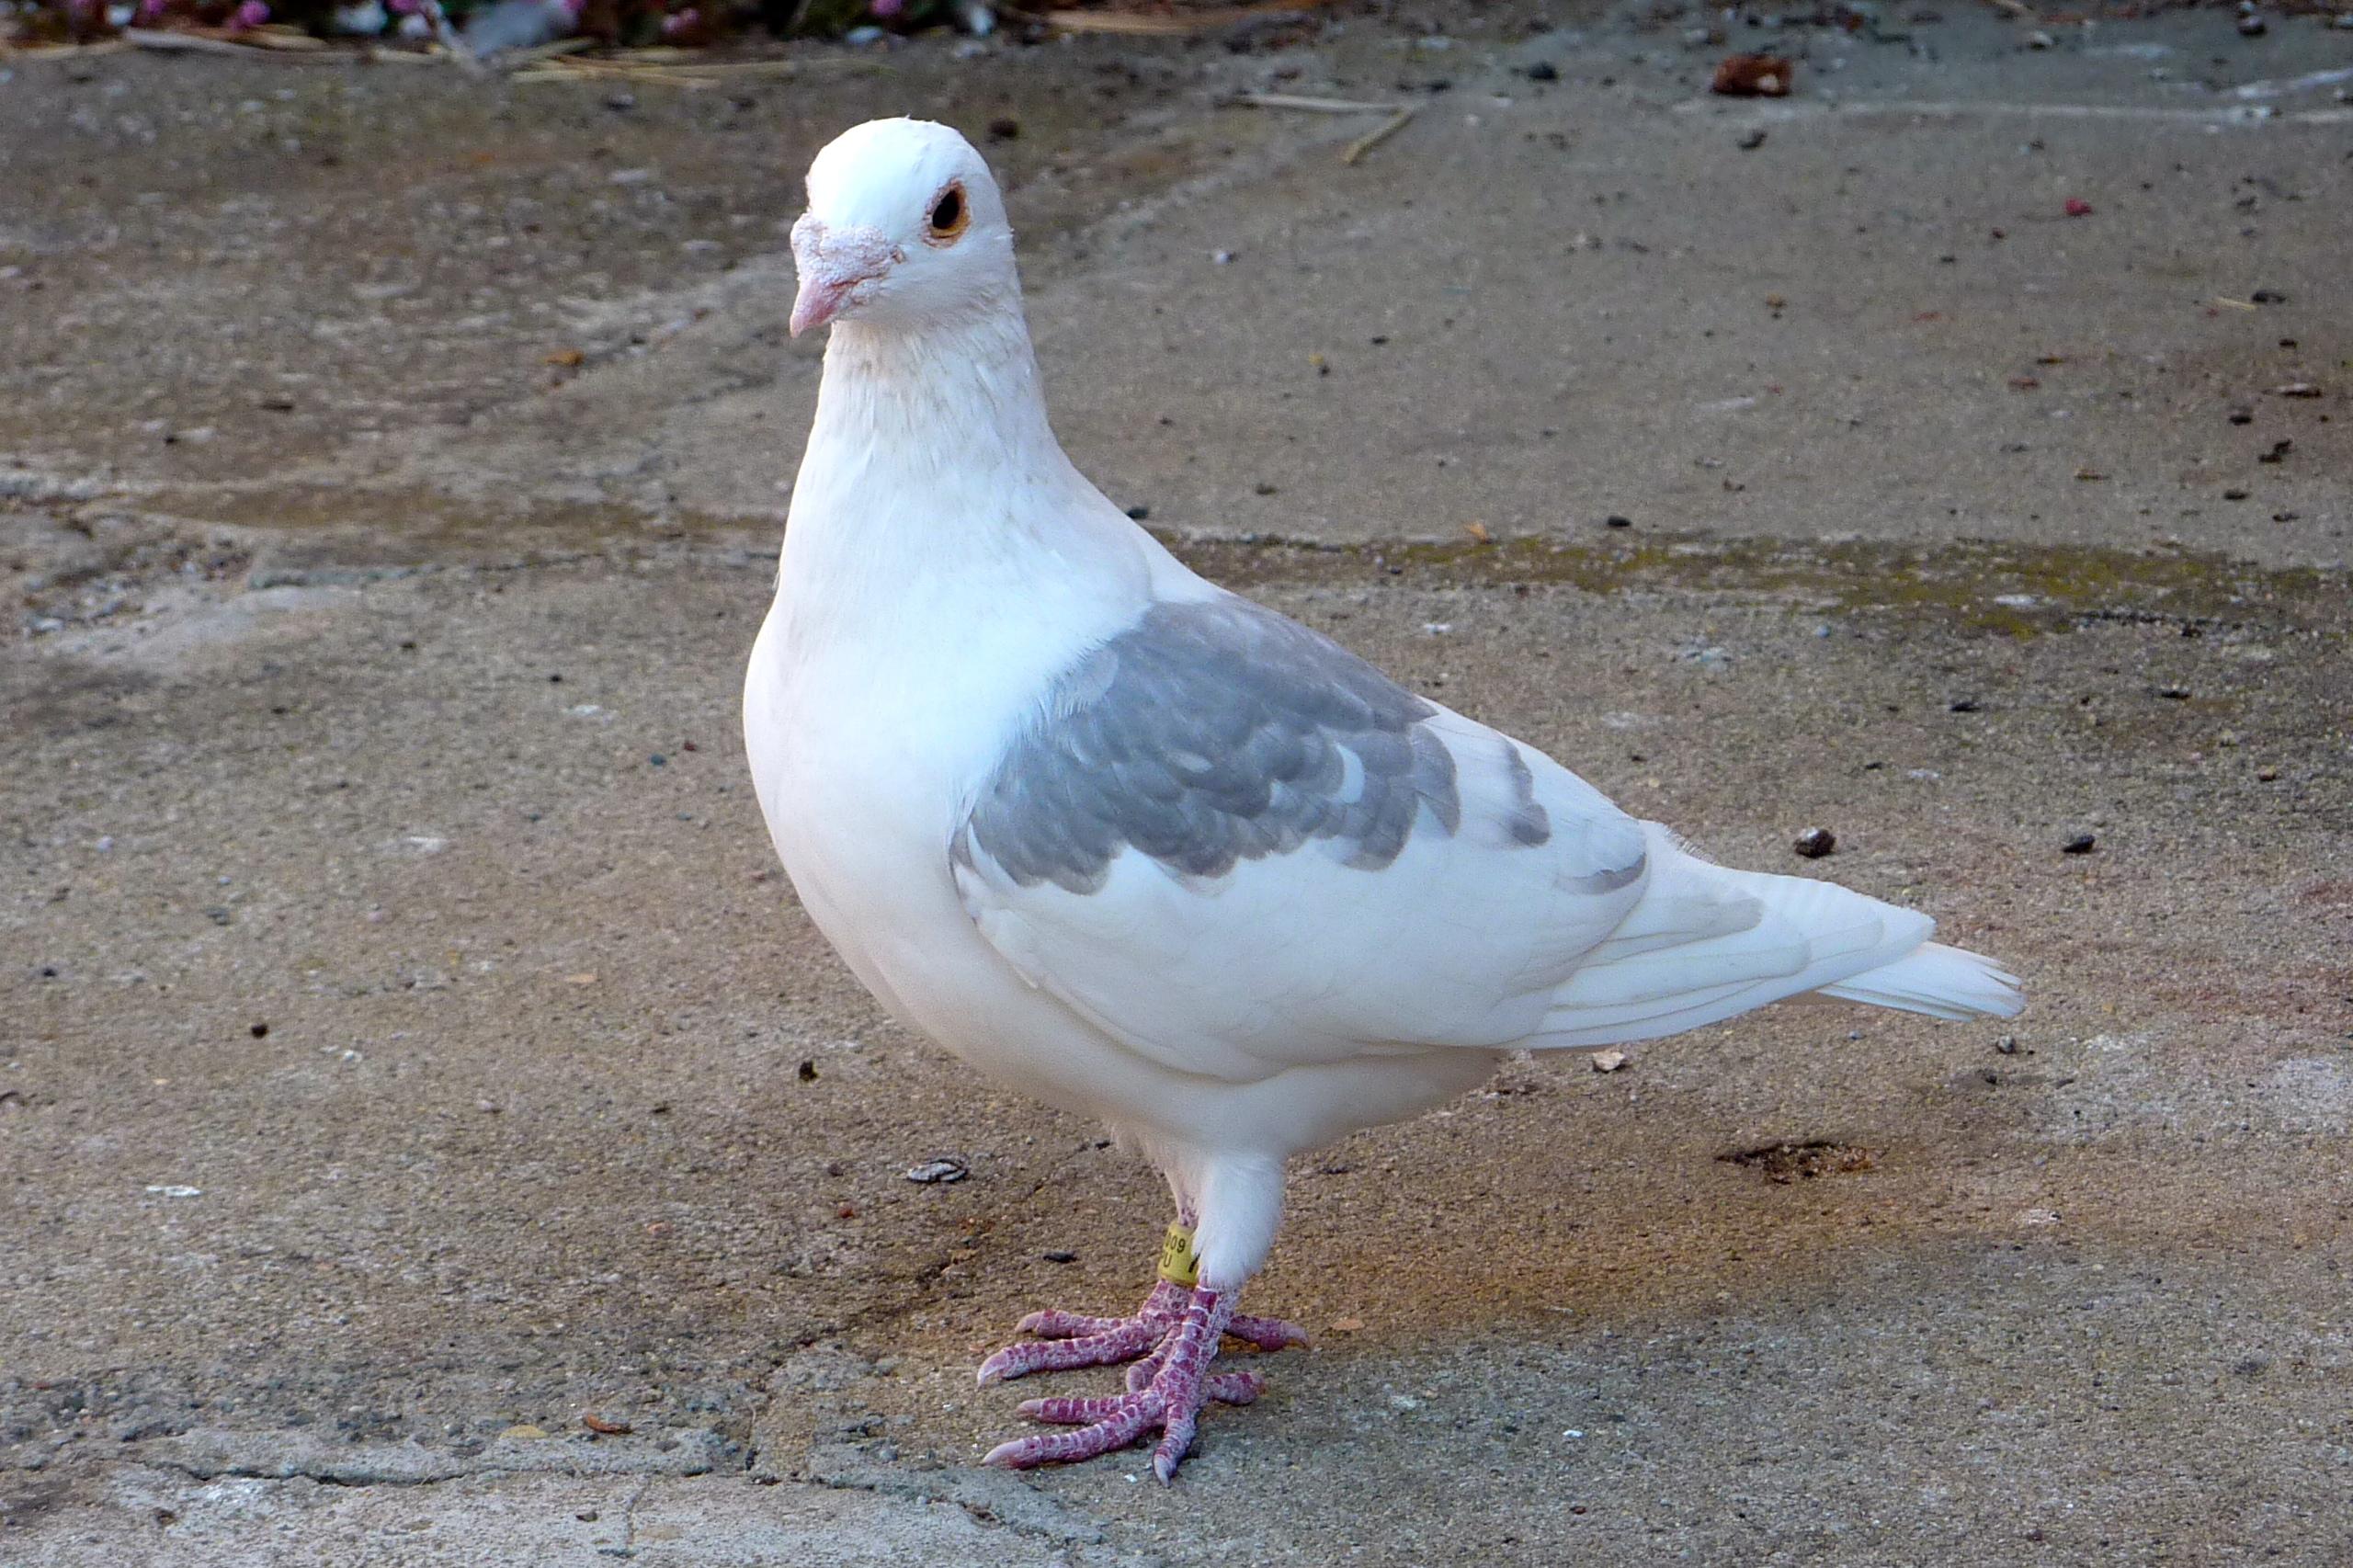 2560x1706 > Pigeon Wallpapers